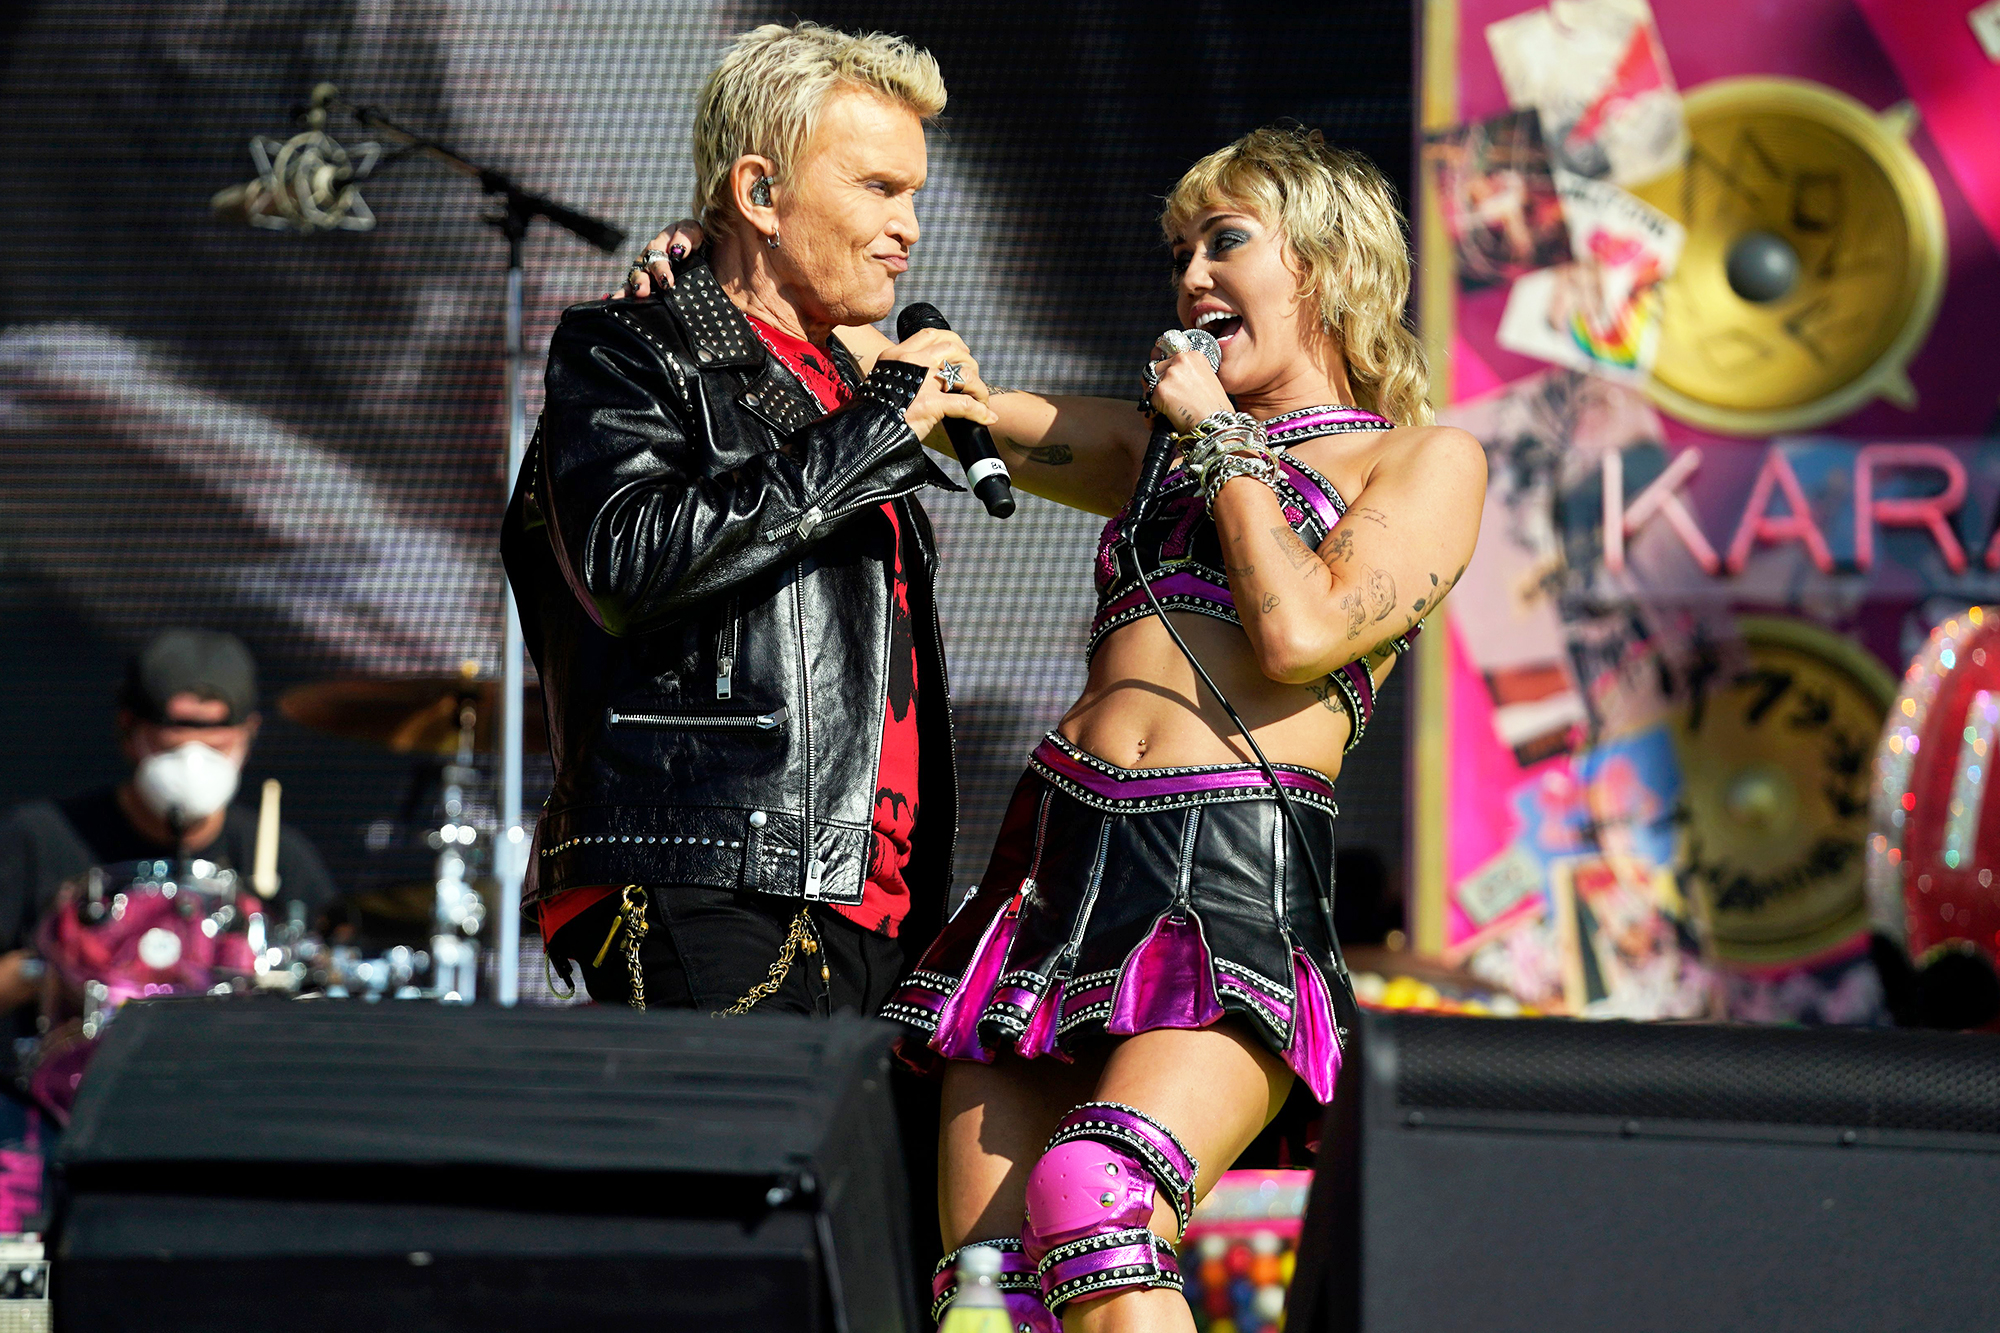 Miley Cyrus and Billy Idol